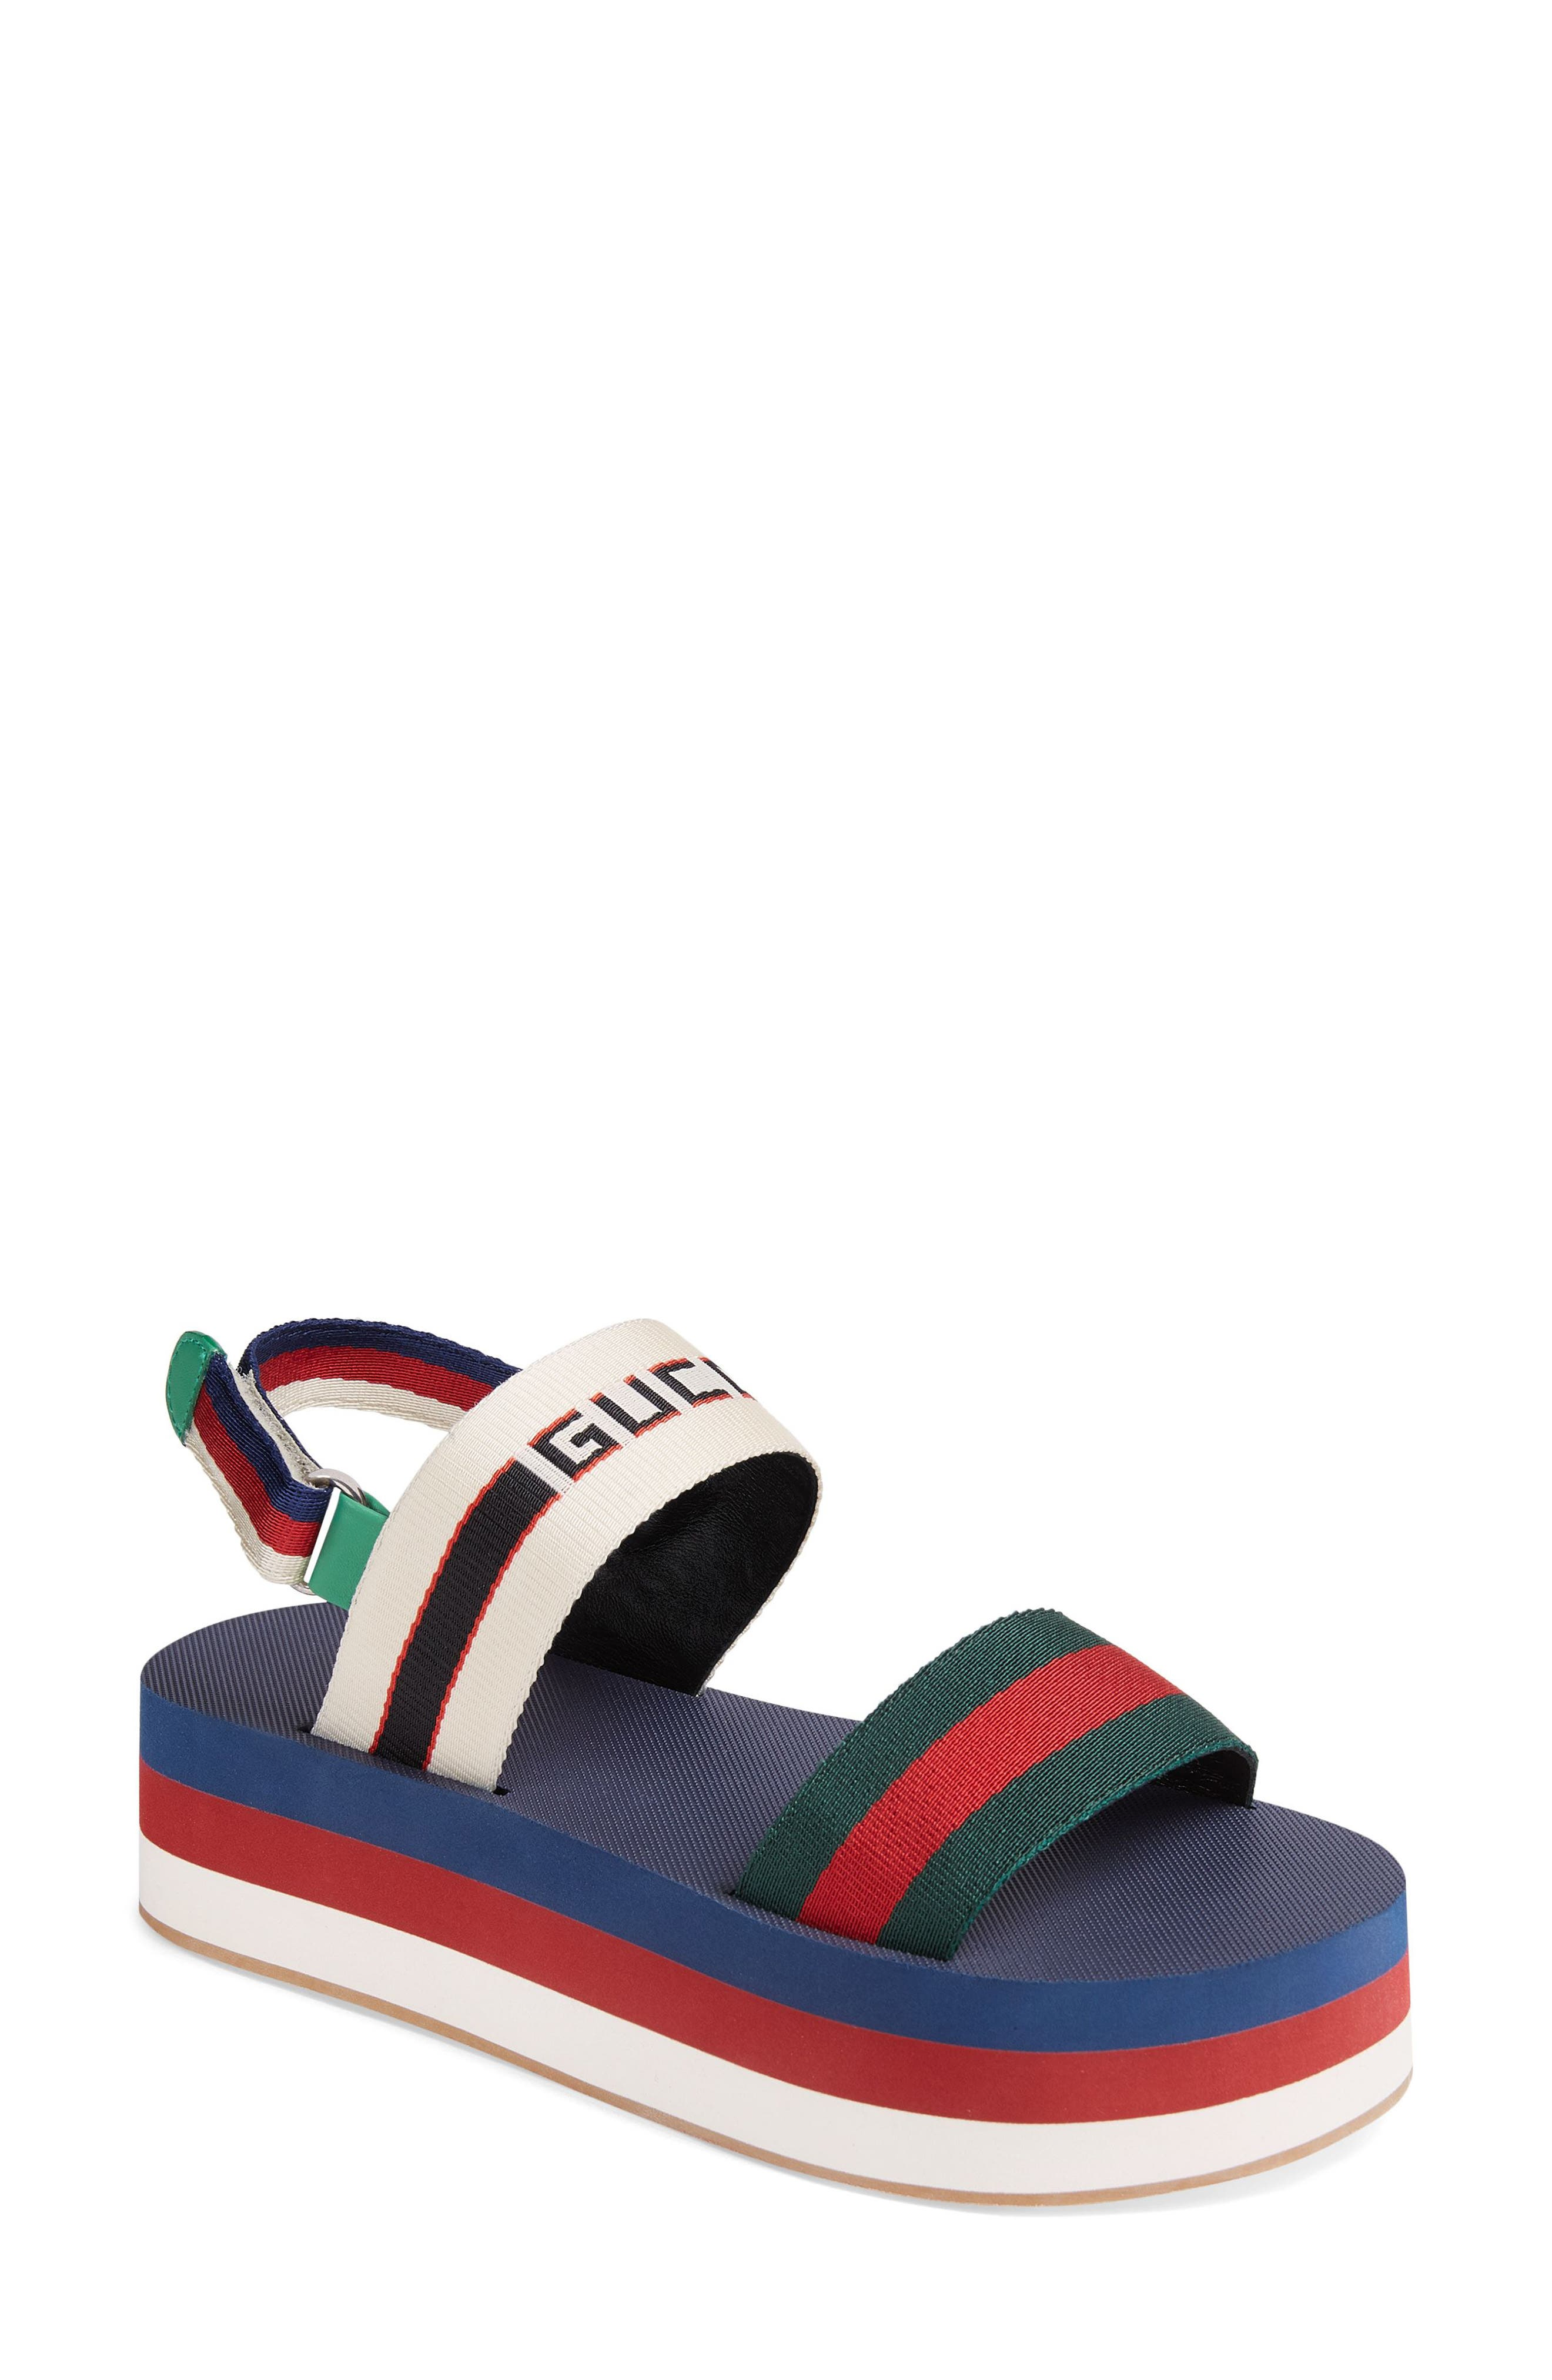 GUCCI, Bedlam Slingback Flatform Sandal, Main thumbnail 1, color, BLUE/ RED